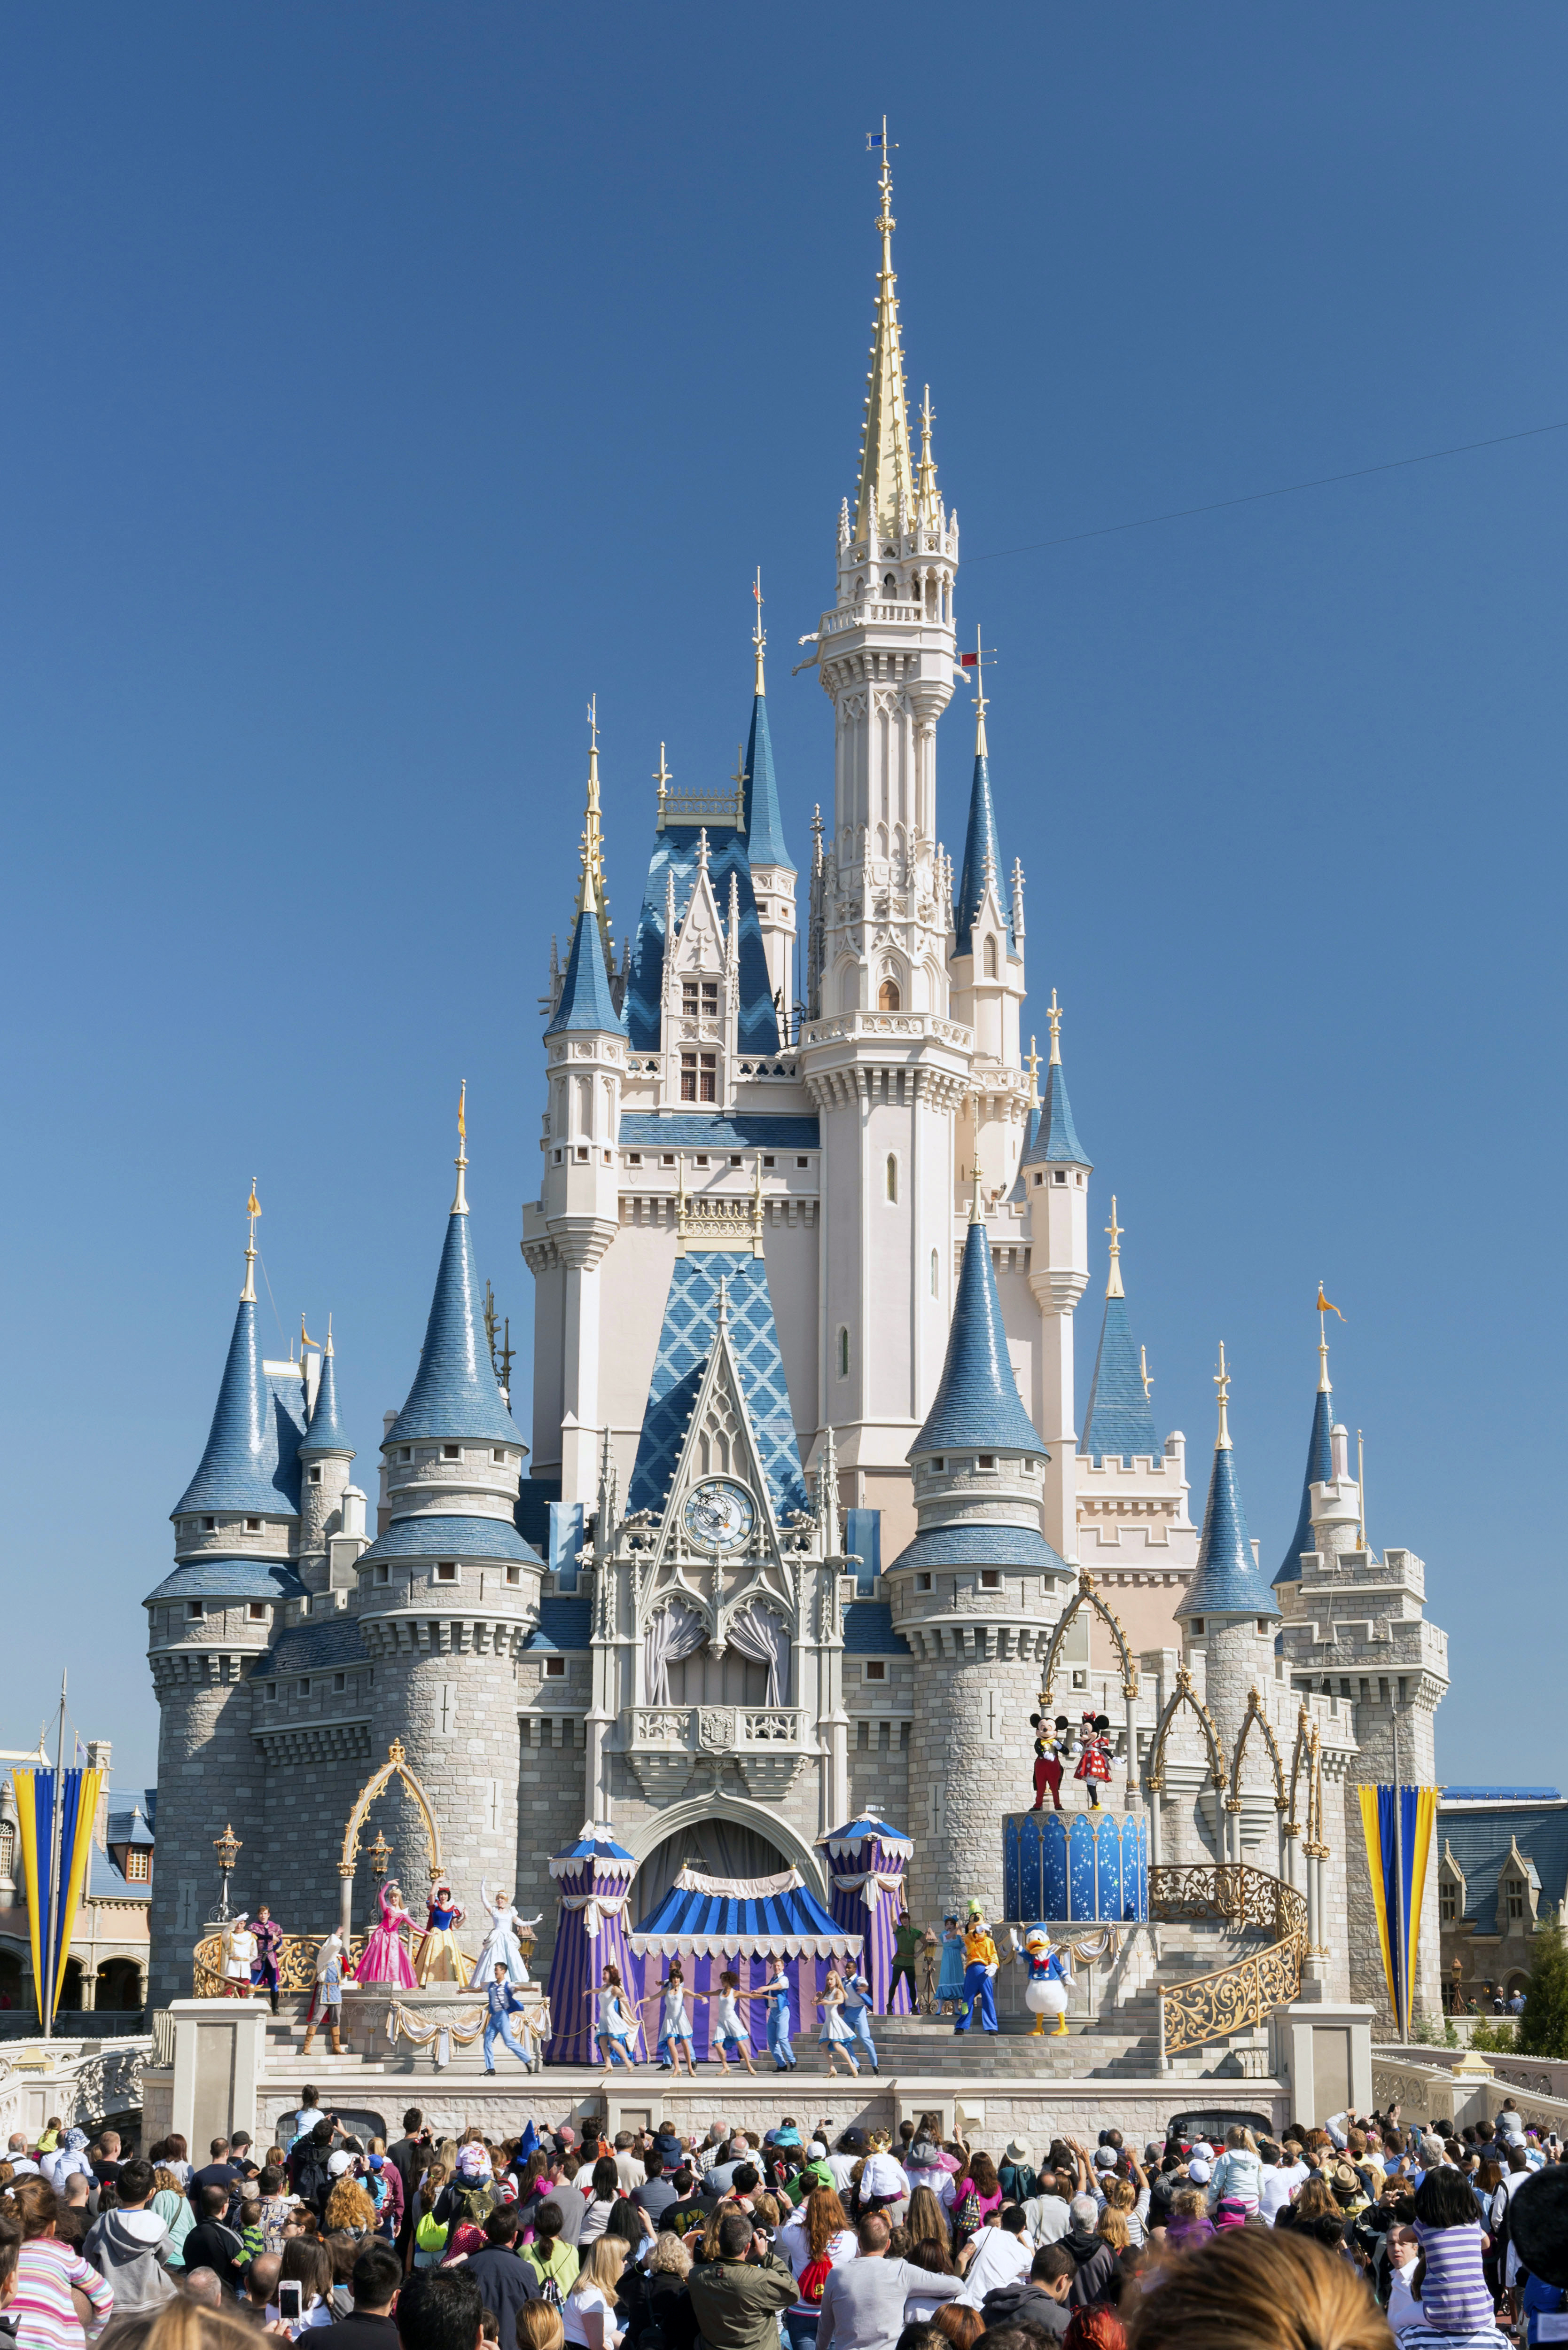 Magic Kingdom Park, Walt Disney World Resort, Orlando, Orlando, Florida